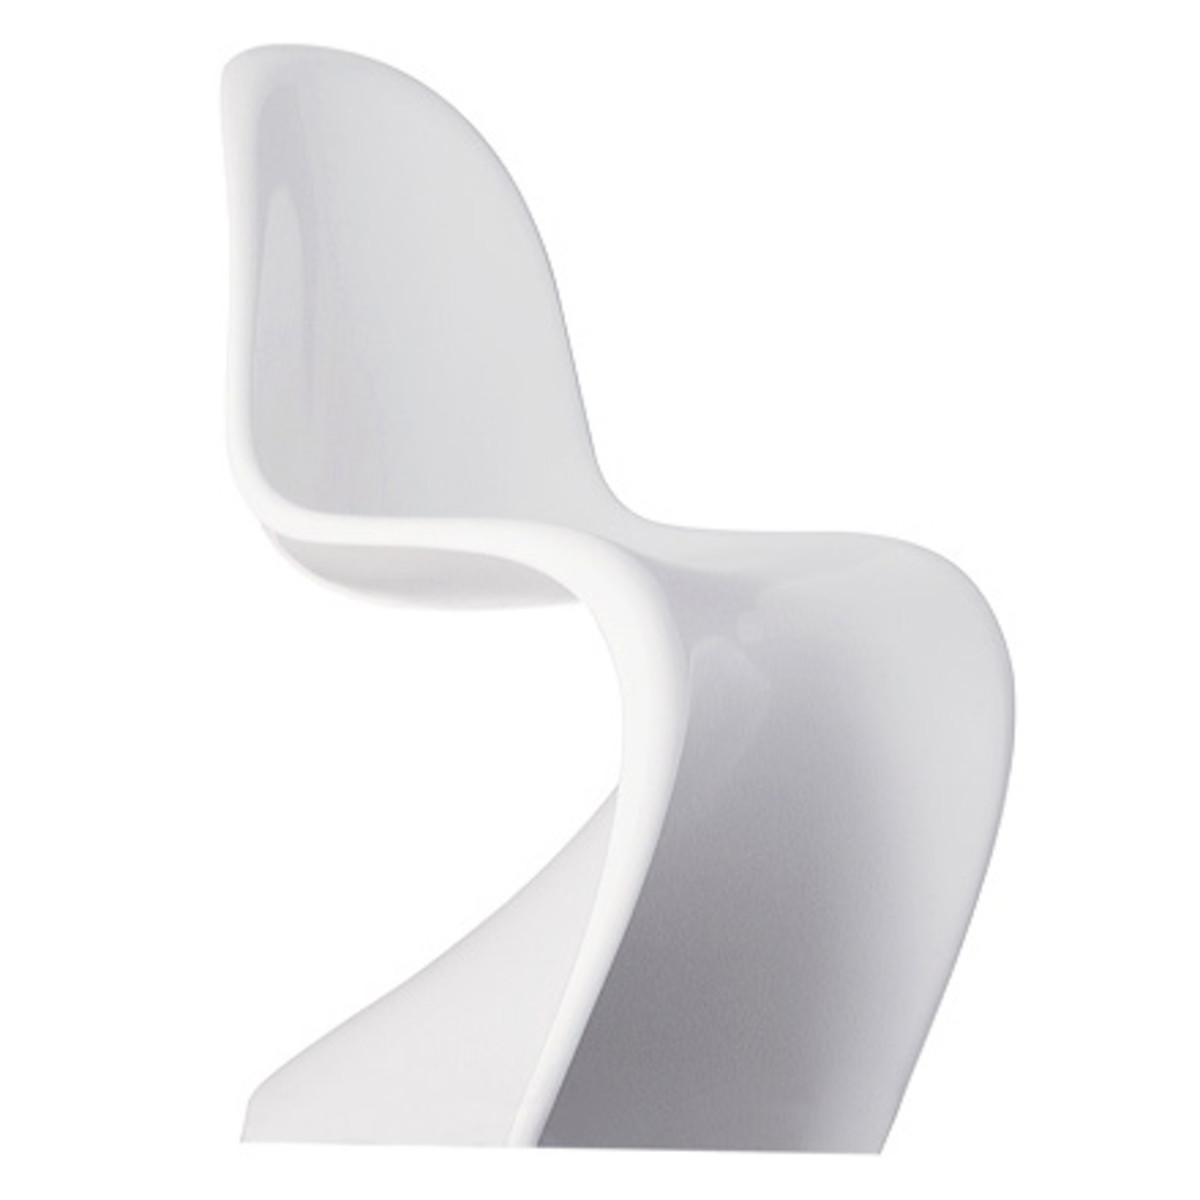 lookslikedesign lookslikedesign panton chair. Black Bedroom Furniture Sets. Home Design Ideas